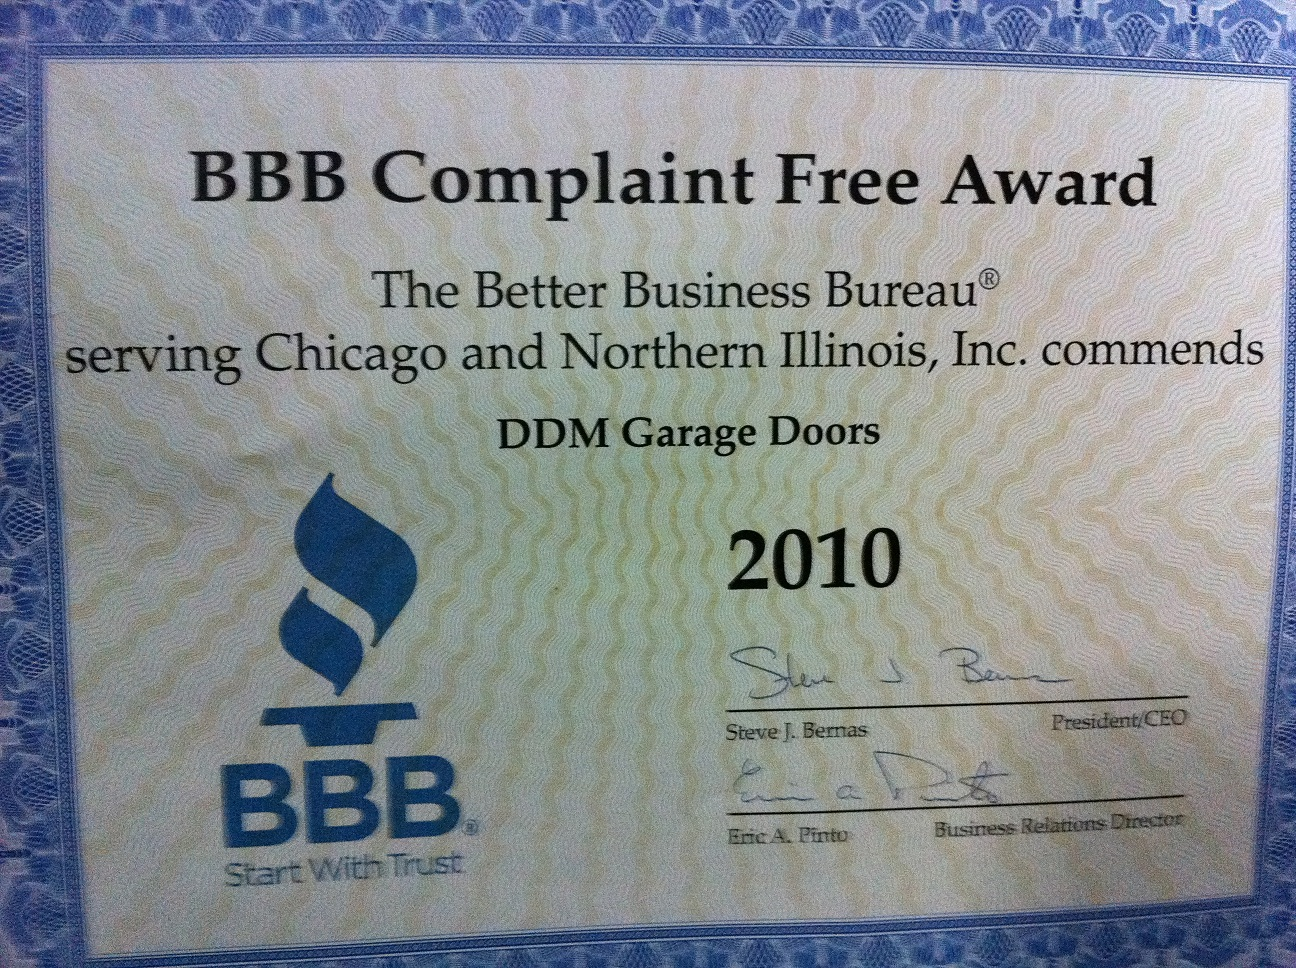 DDM Garage Doors Awarded